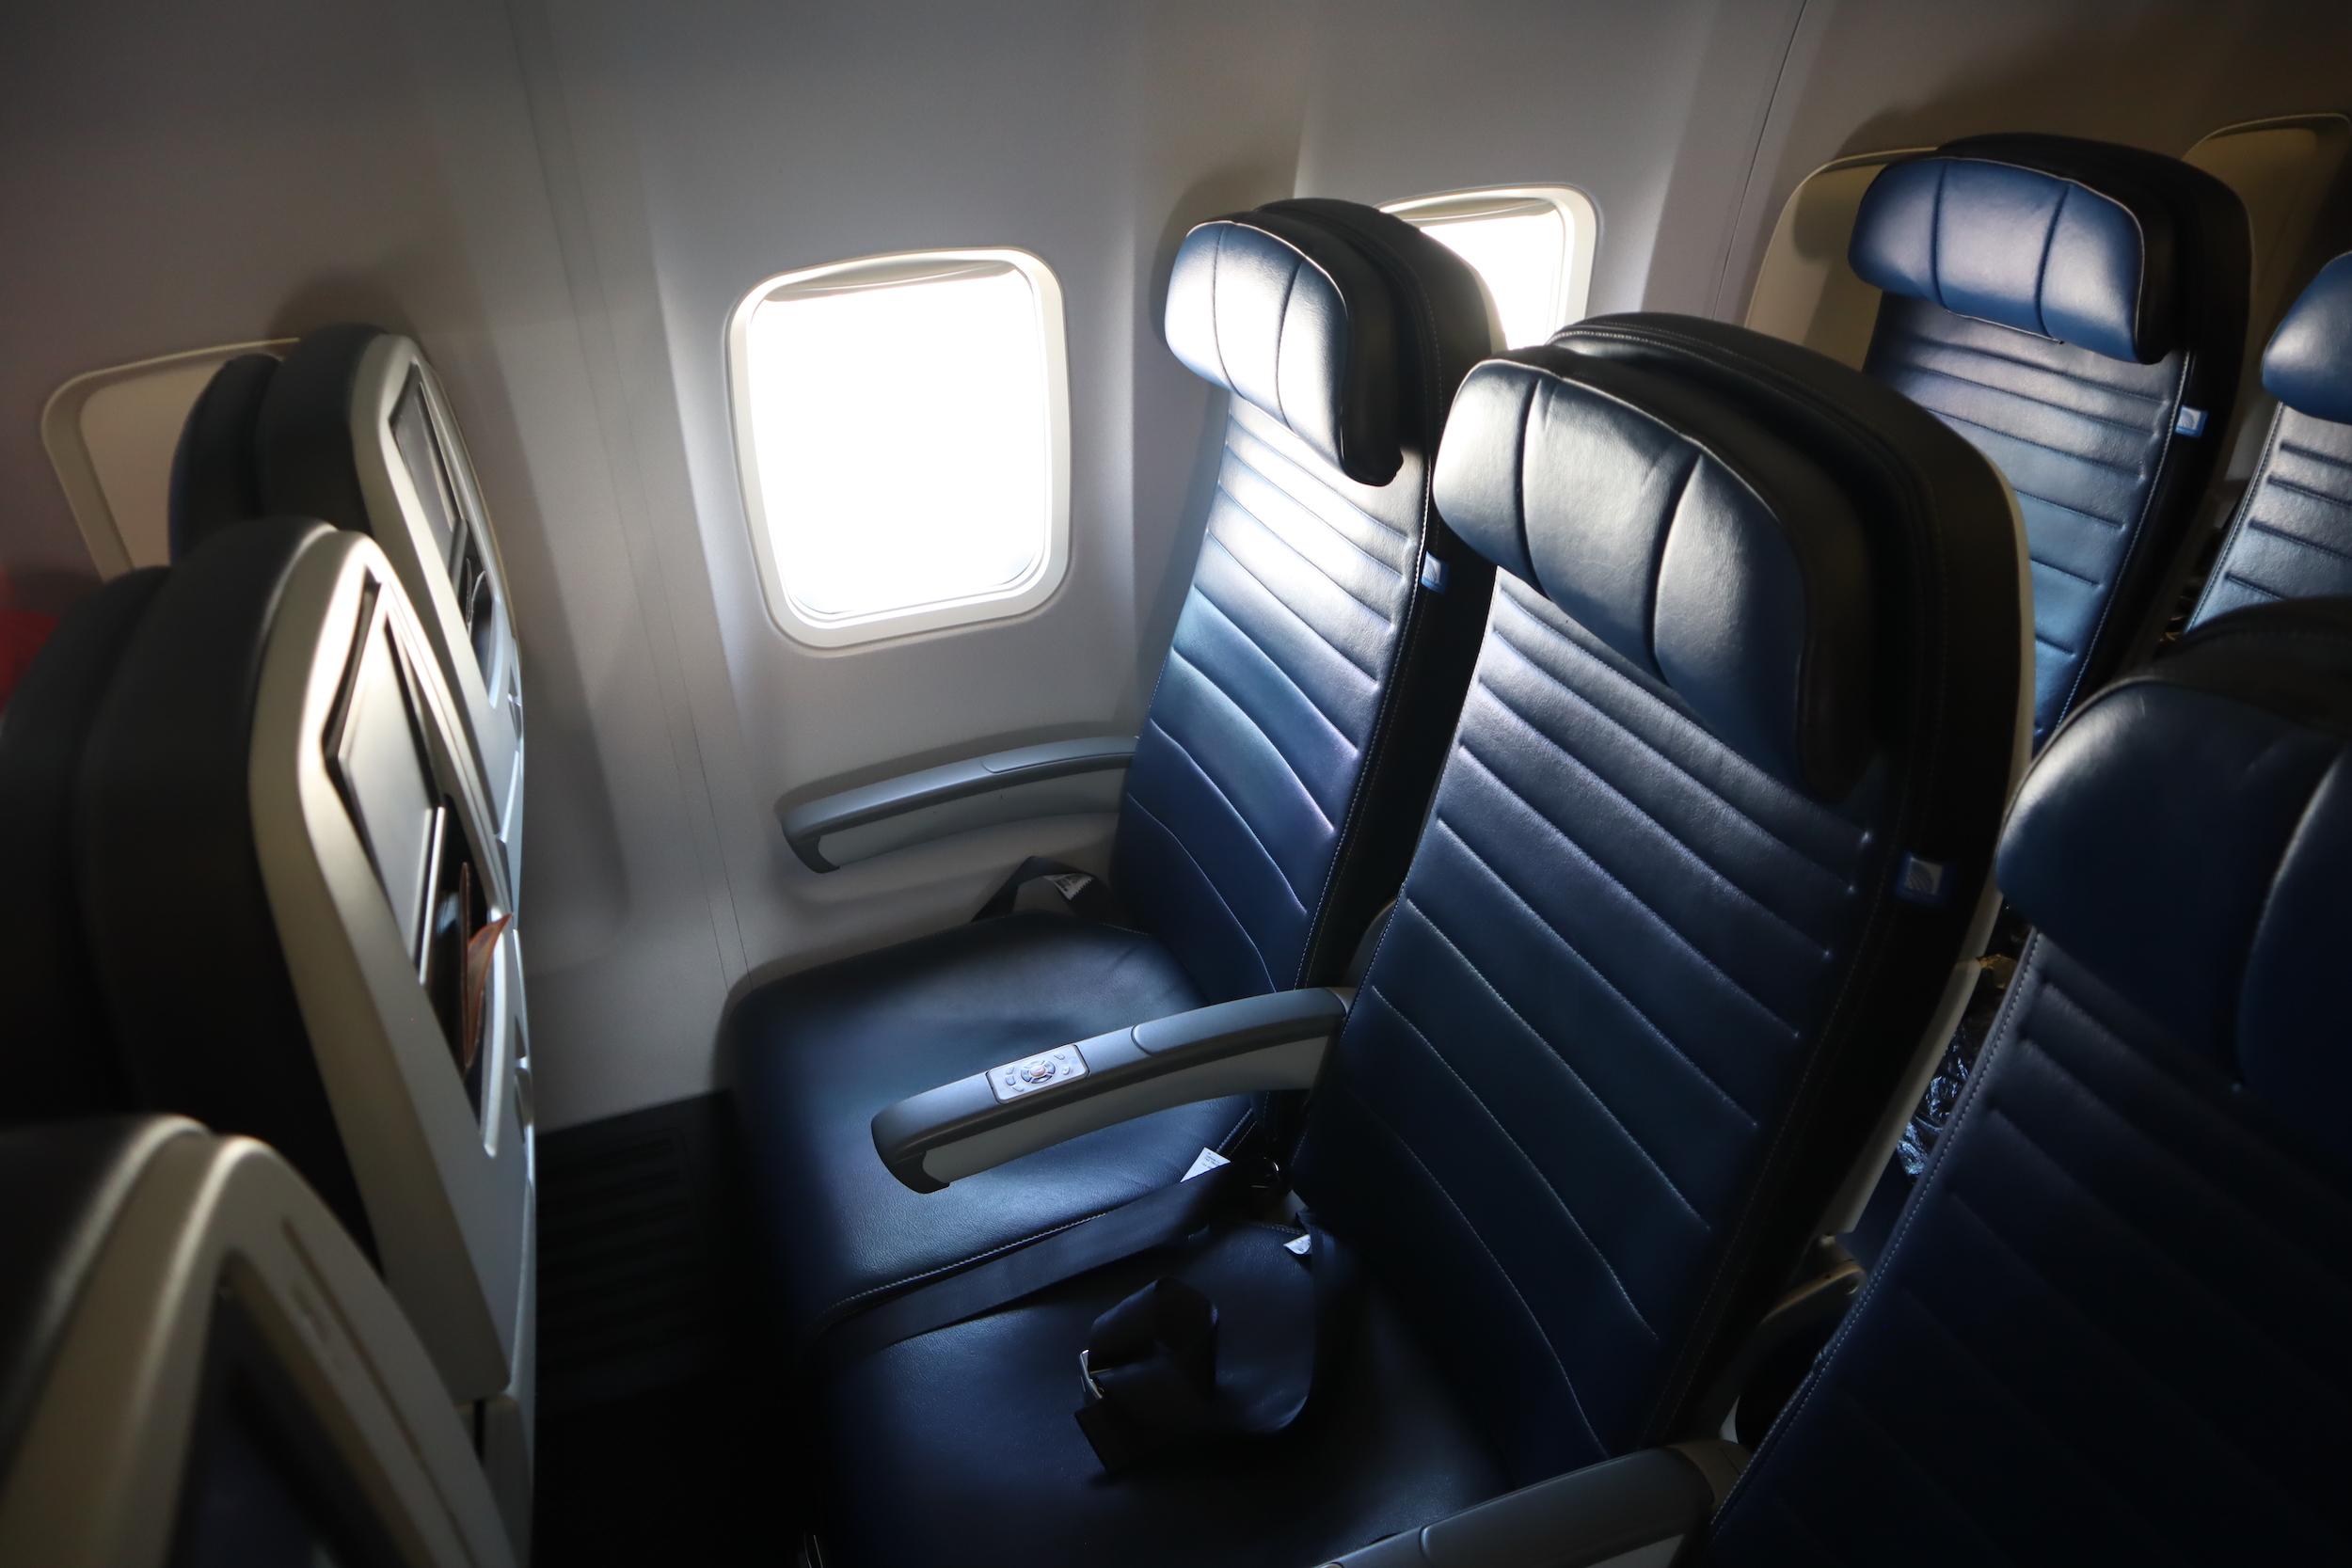 United 737 economy class – Seat 27F